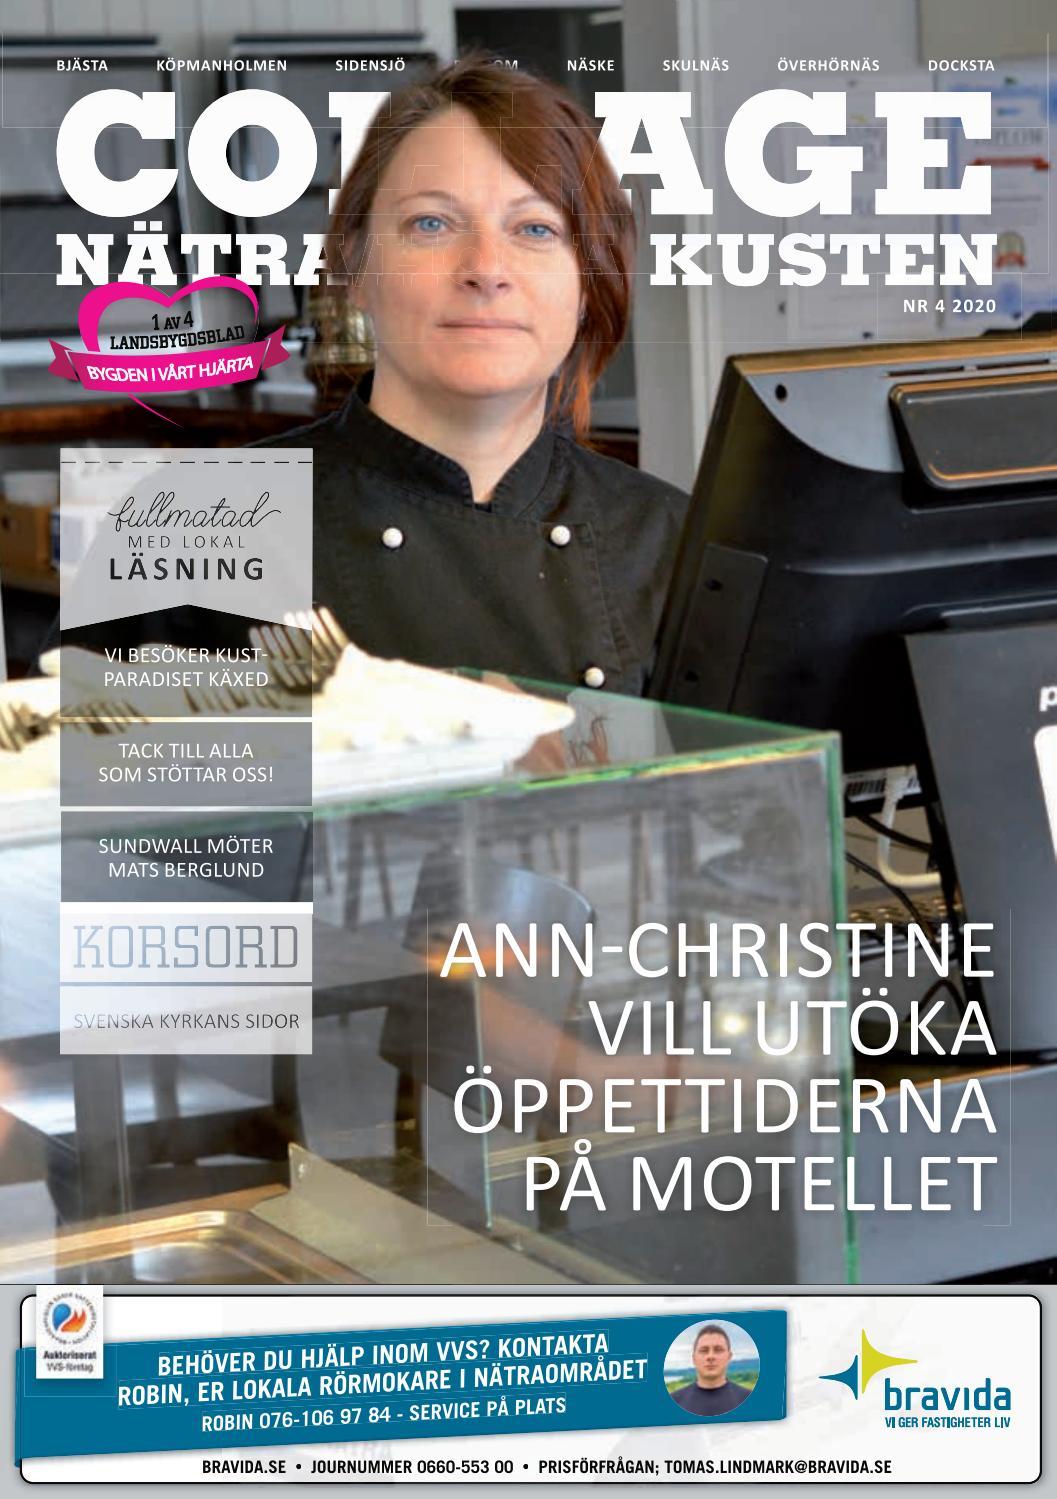 Sveriges ledande fastighetsrådgivare | Svefa